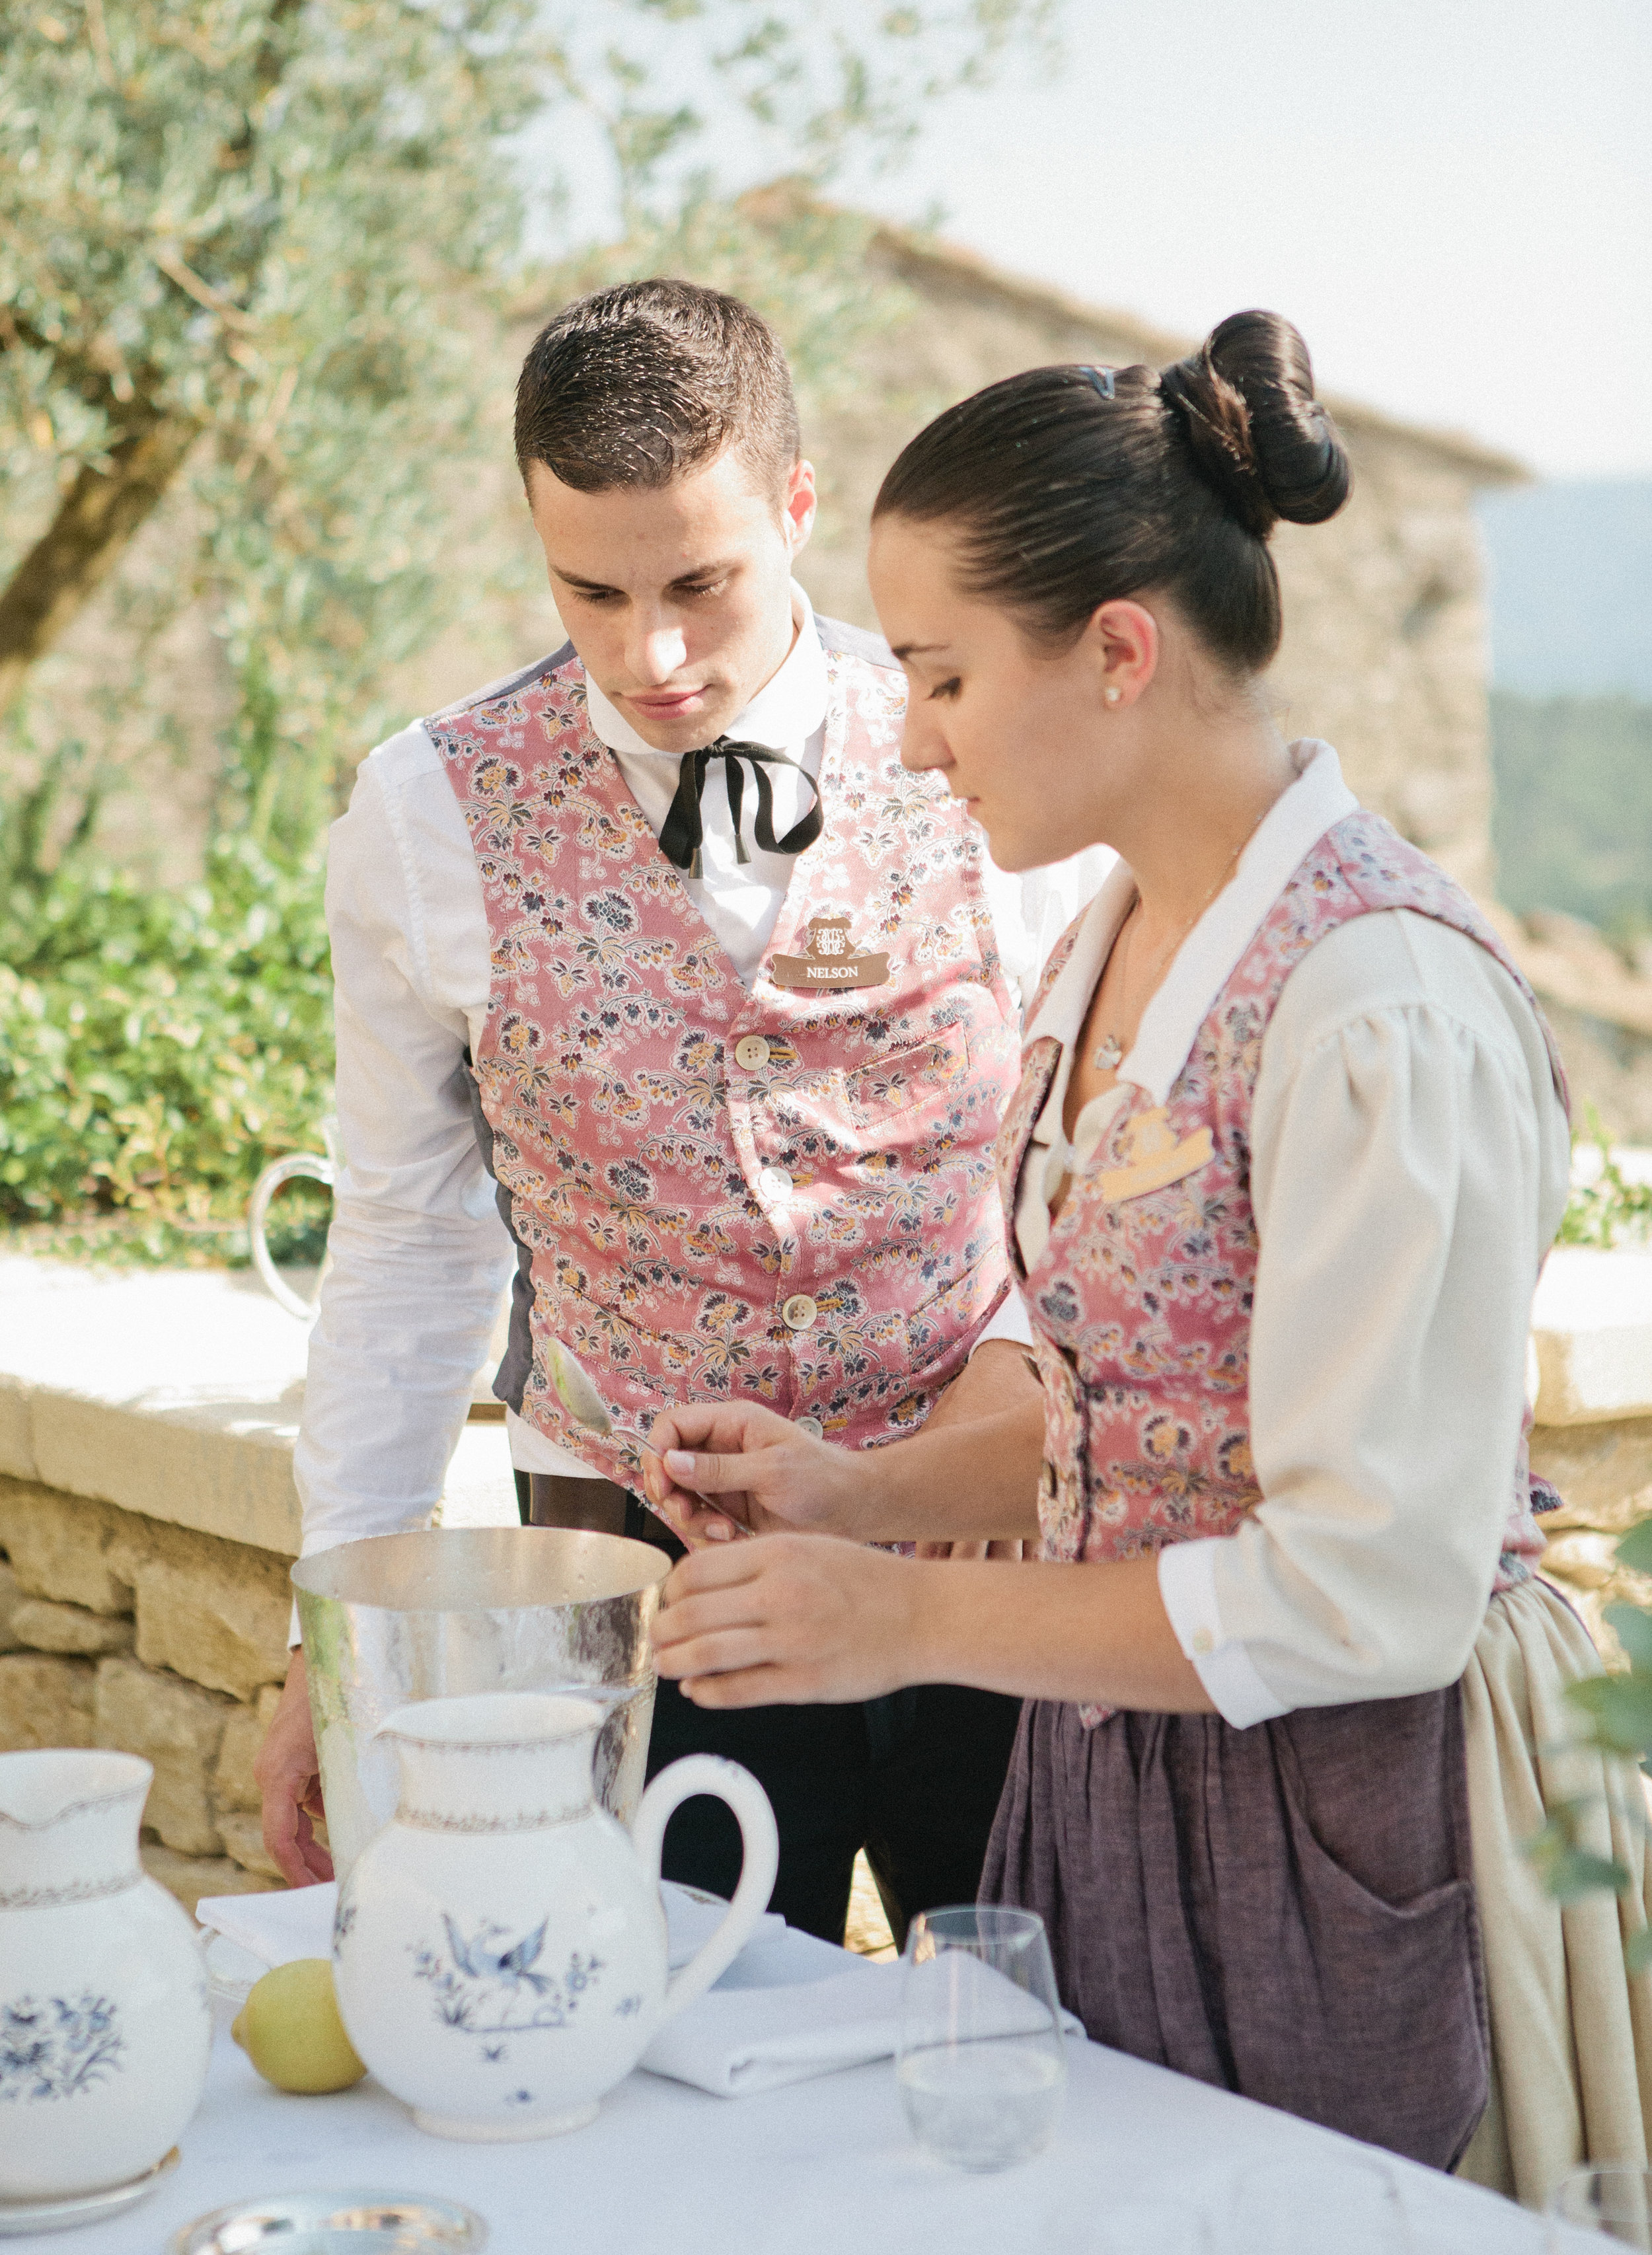 provence-wedding-rory-wylie.jpg-44.jpg